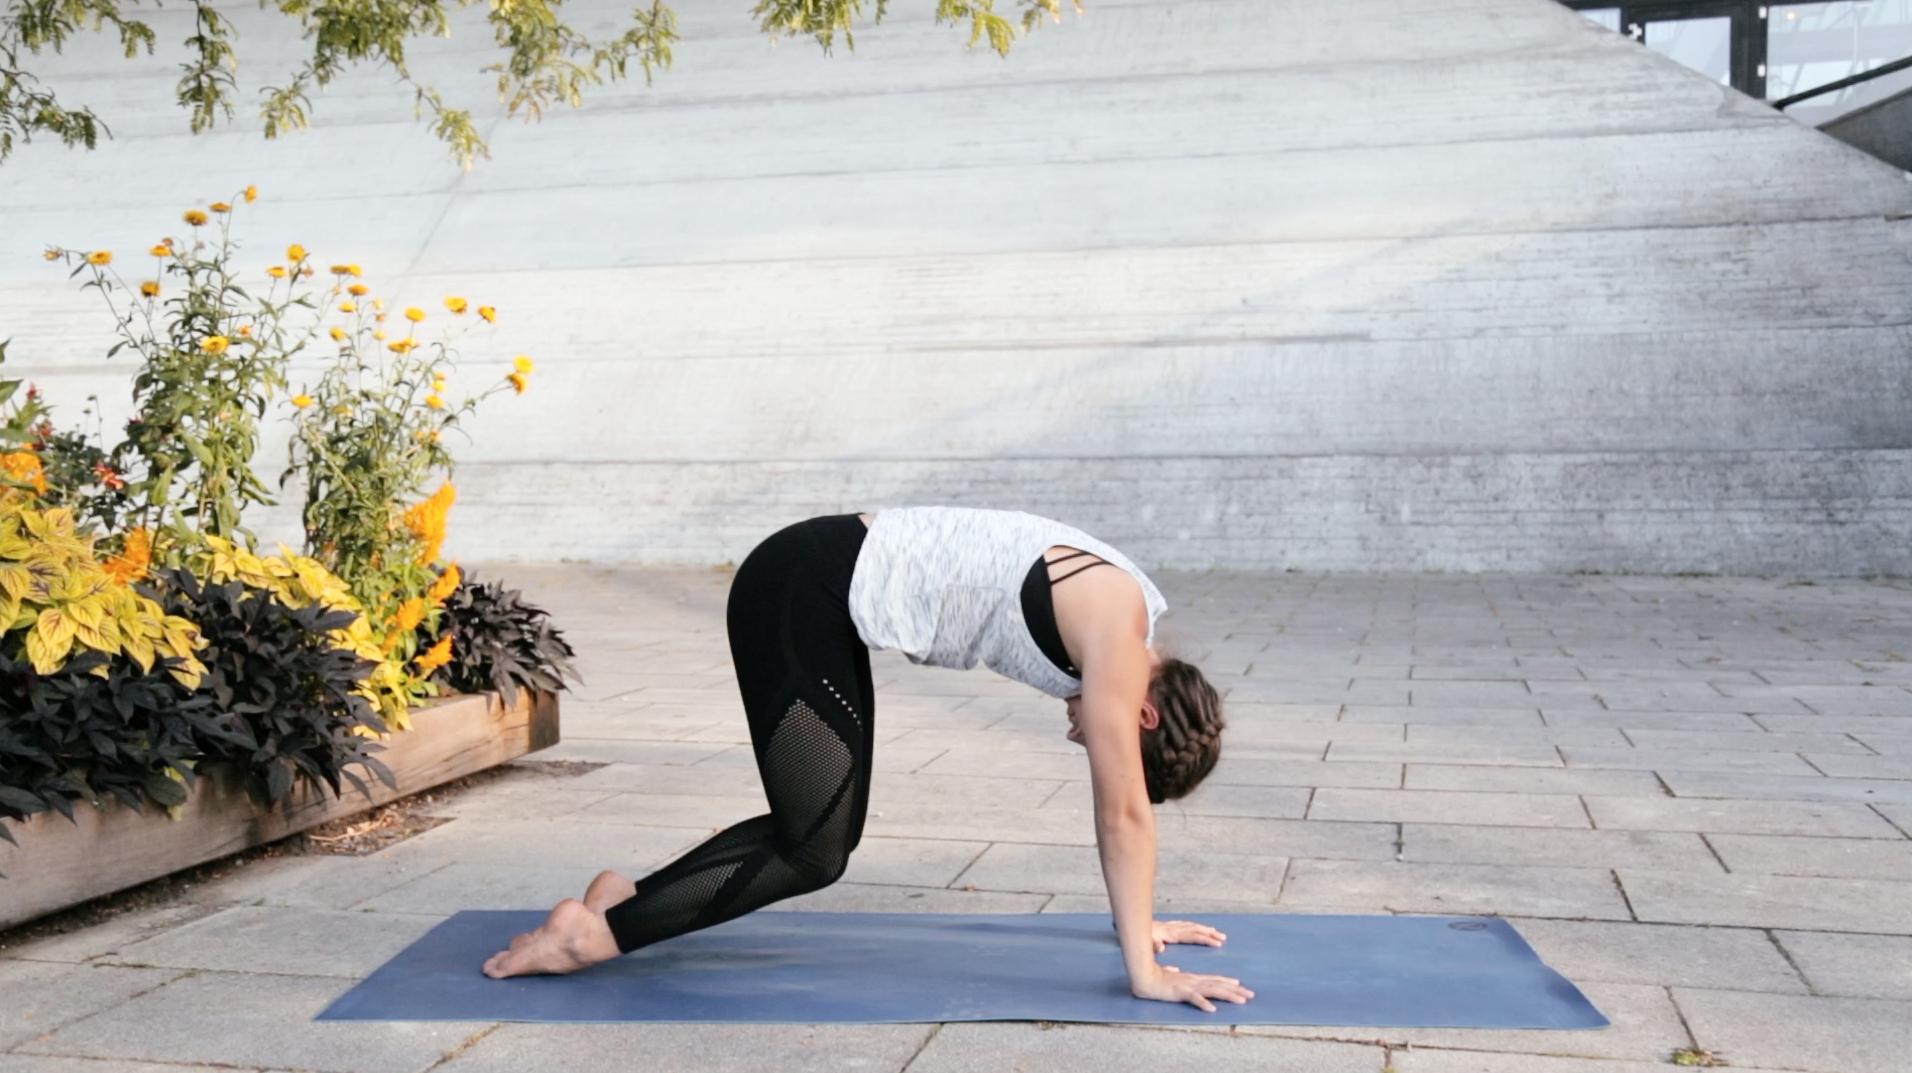 Mady-Morrison-Yoga-Flow-Bauch-Sixpack-00005